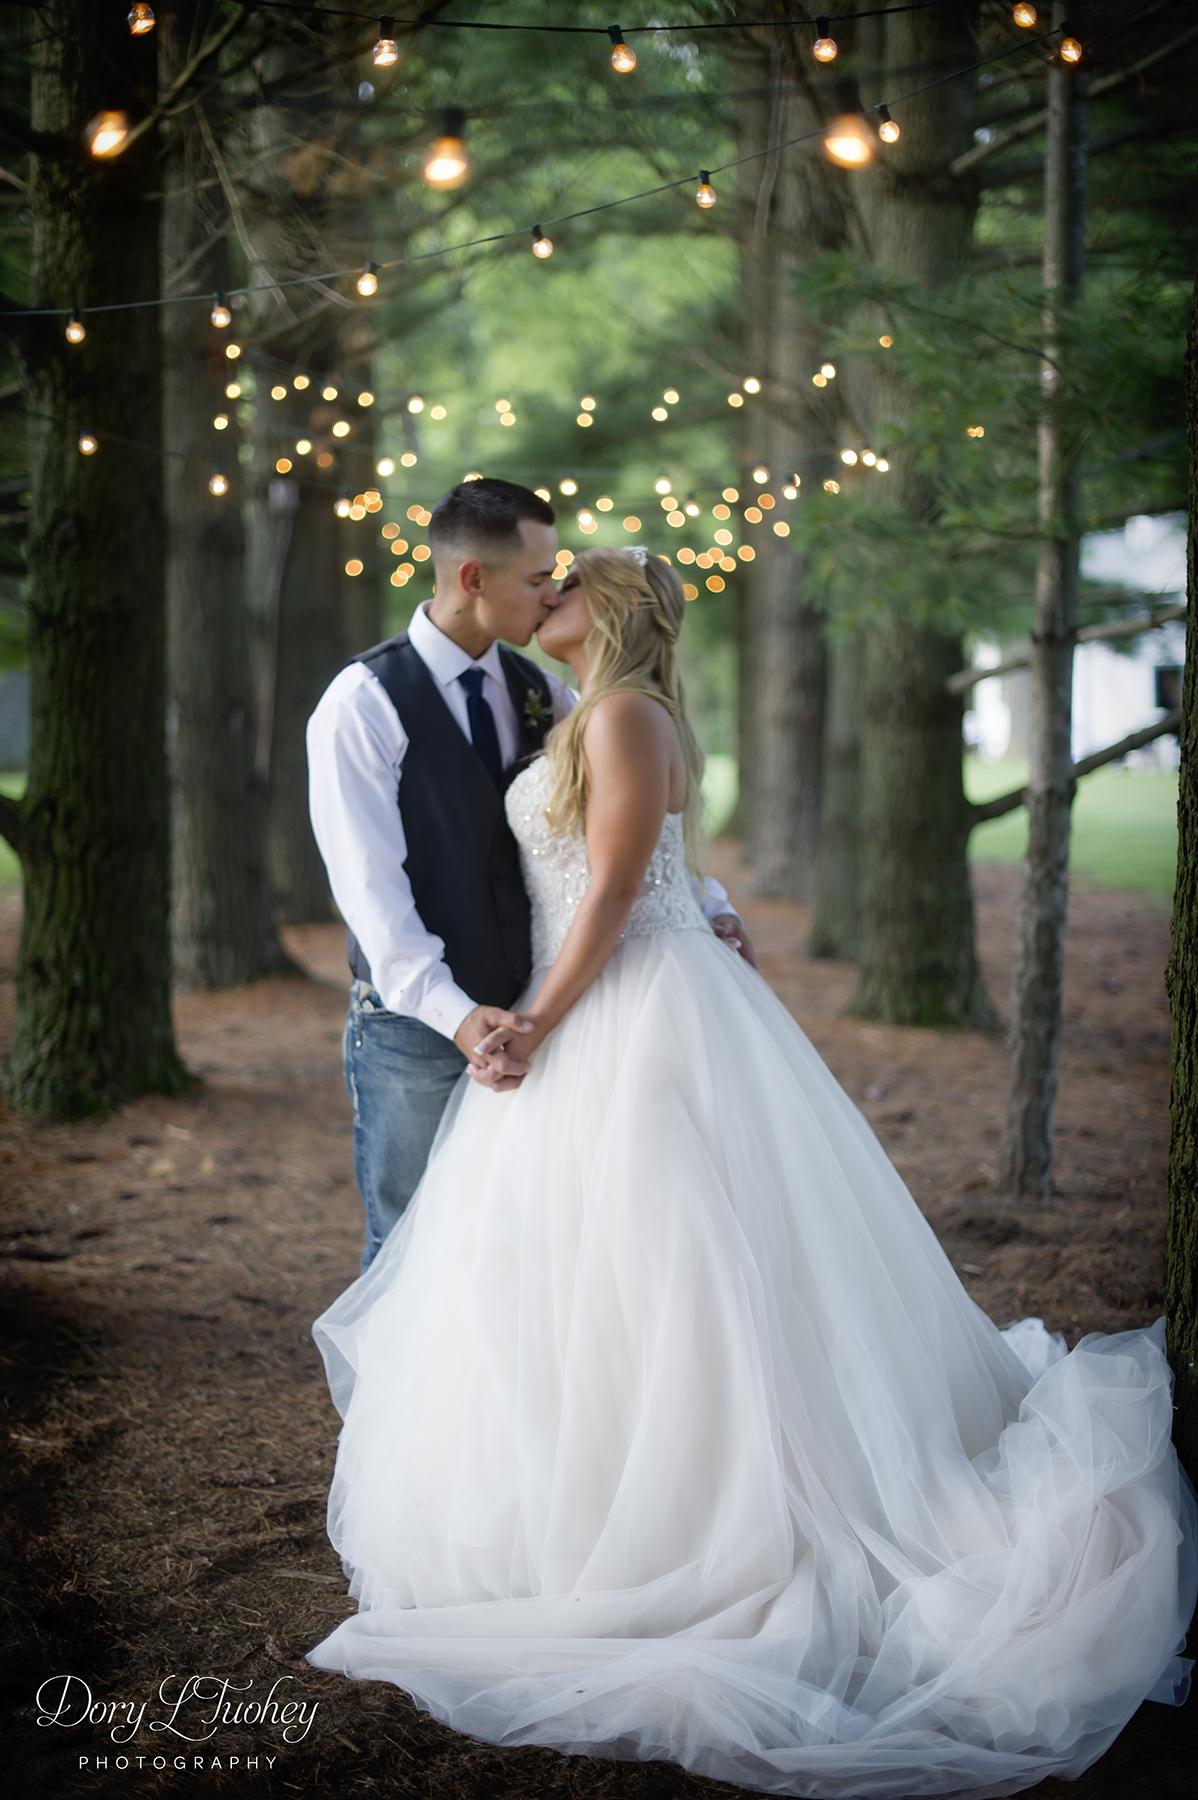 Dory_wedding_oak_hill_galena_farm_horses_field_bride_tulle_photographer_light_pine_tree_kiss_love_groom_twinkle_02.jpg